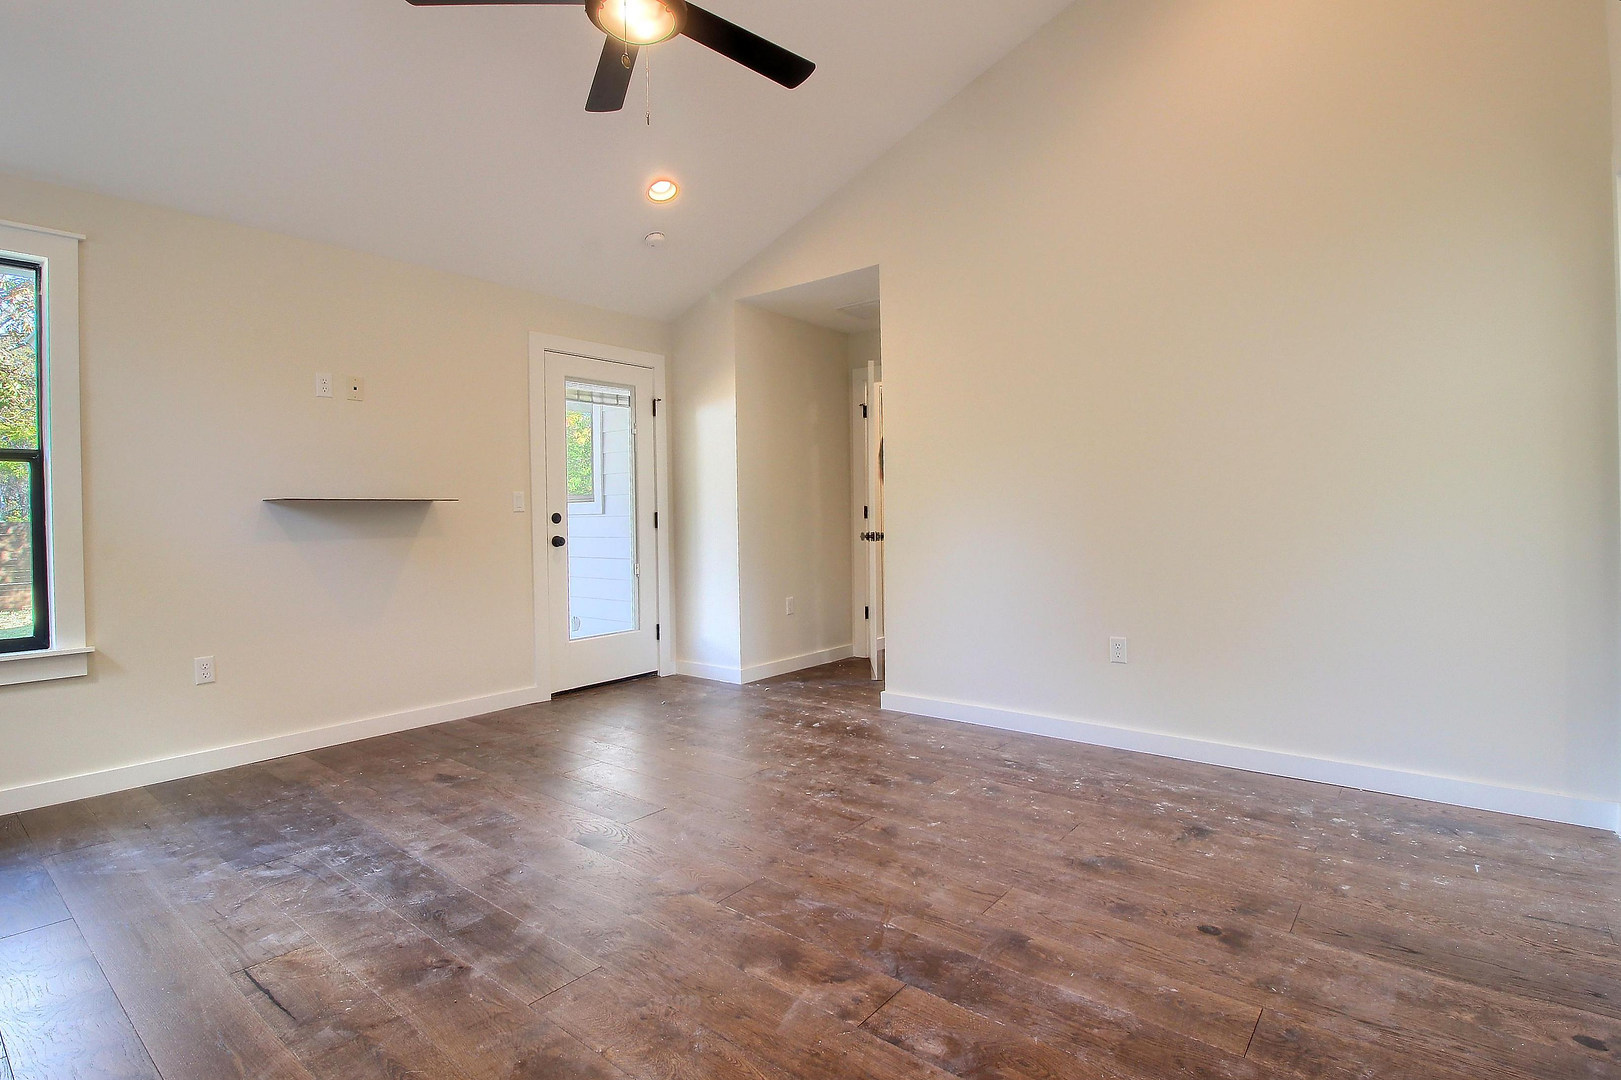 Home Renovation Master Bedroom on Bouldin in Austin, TX